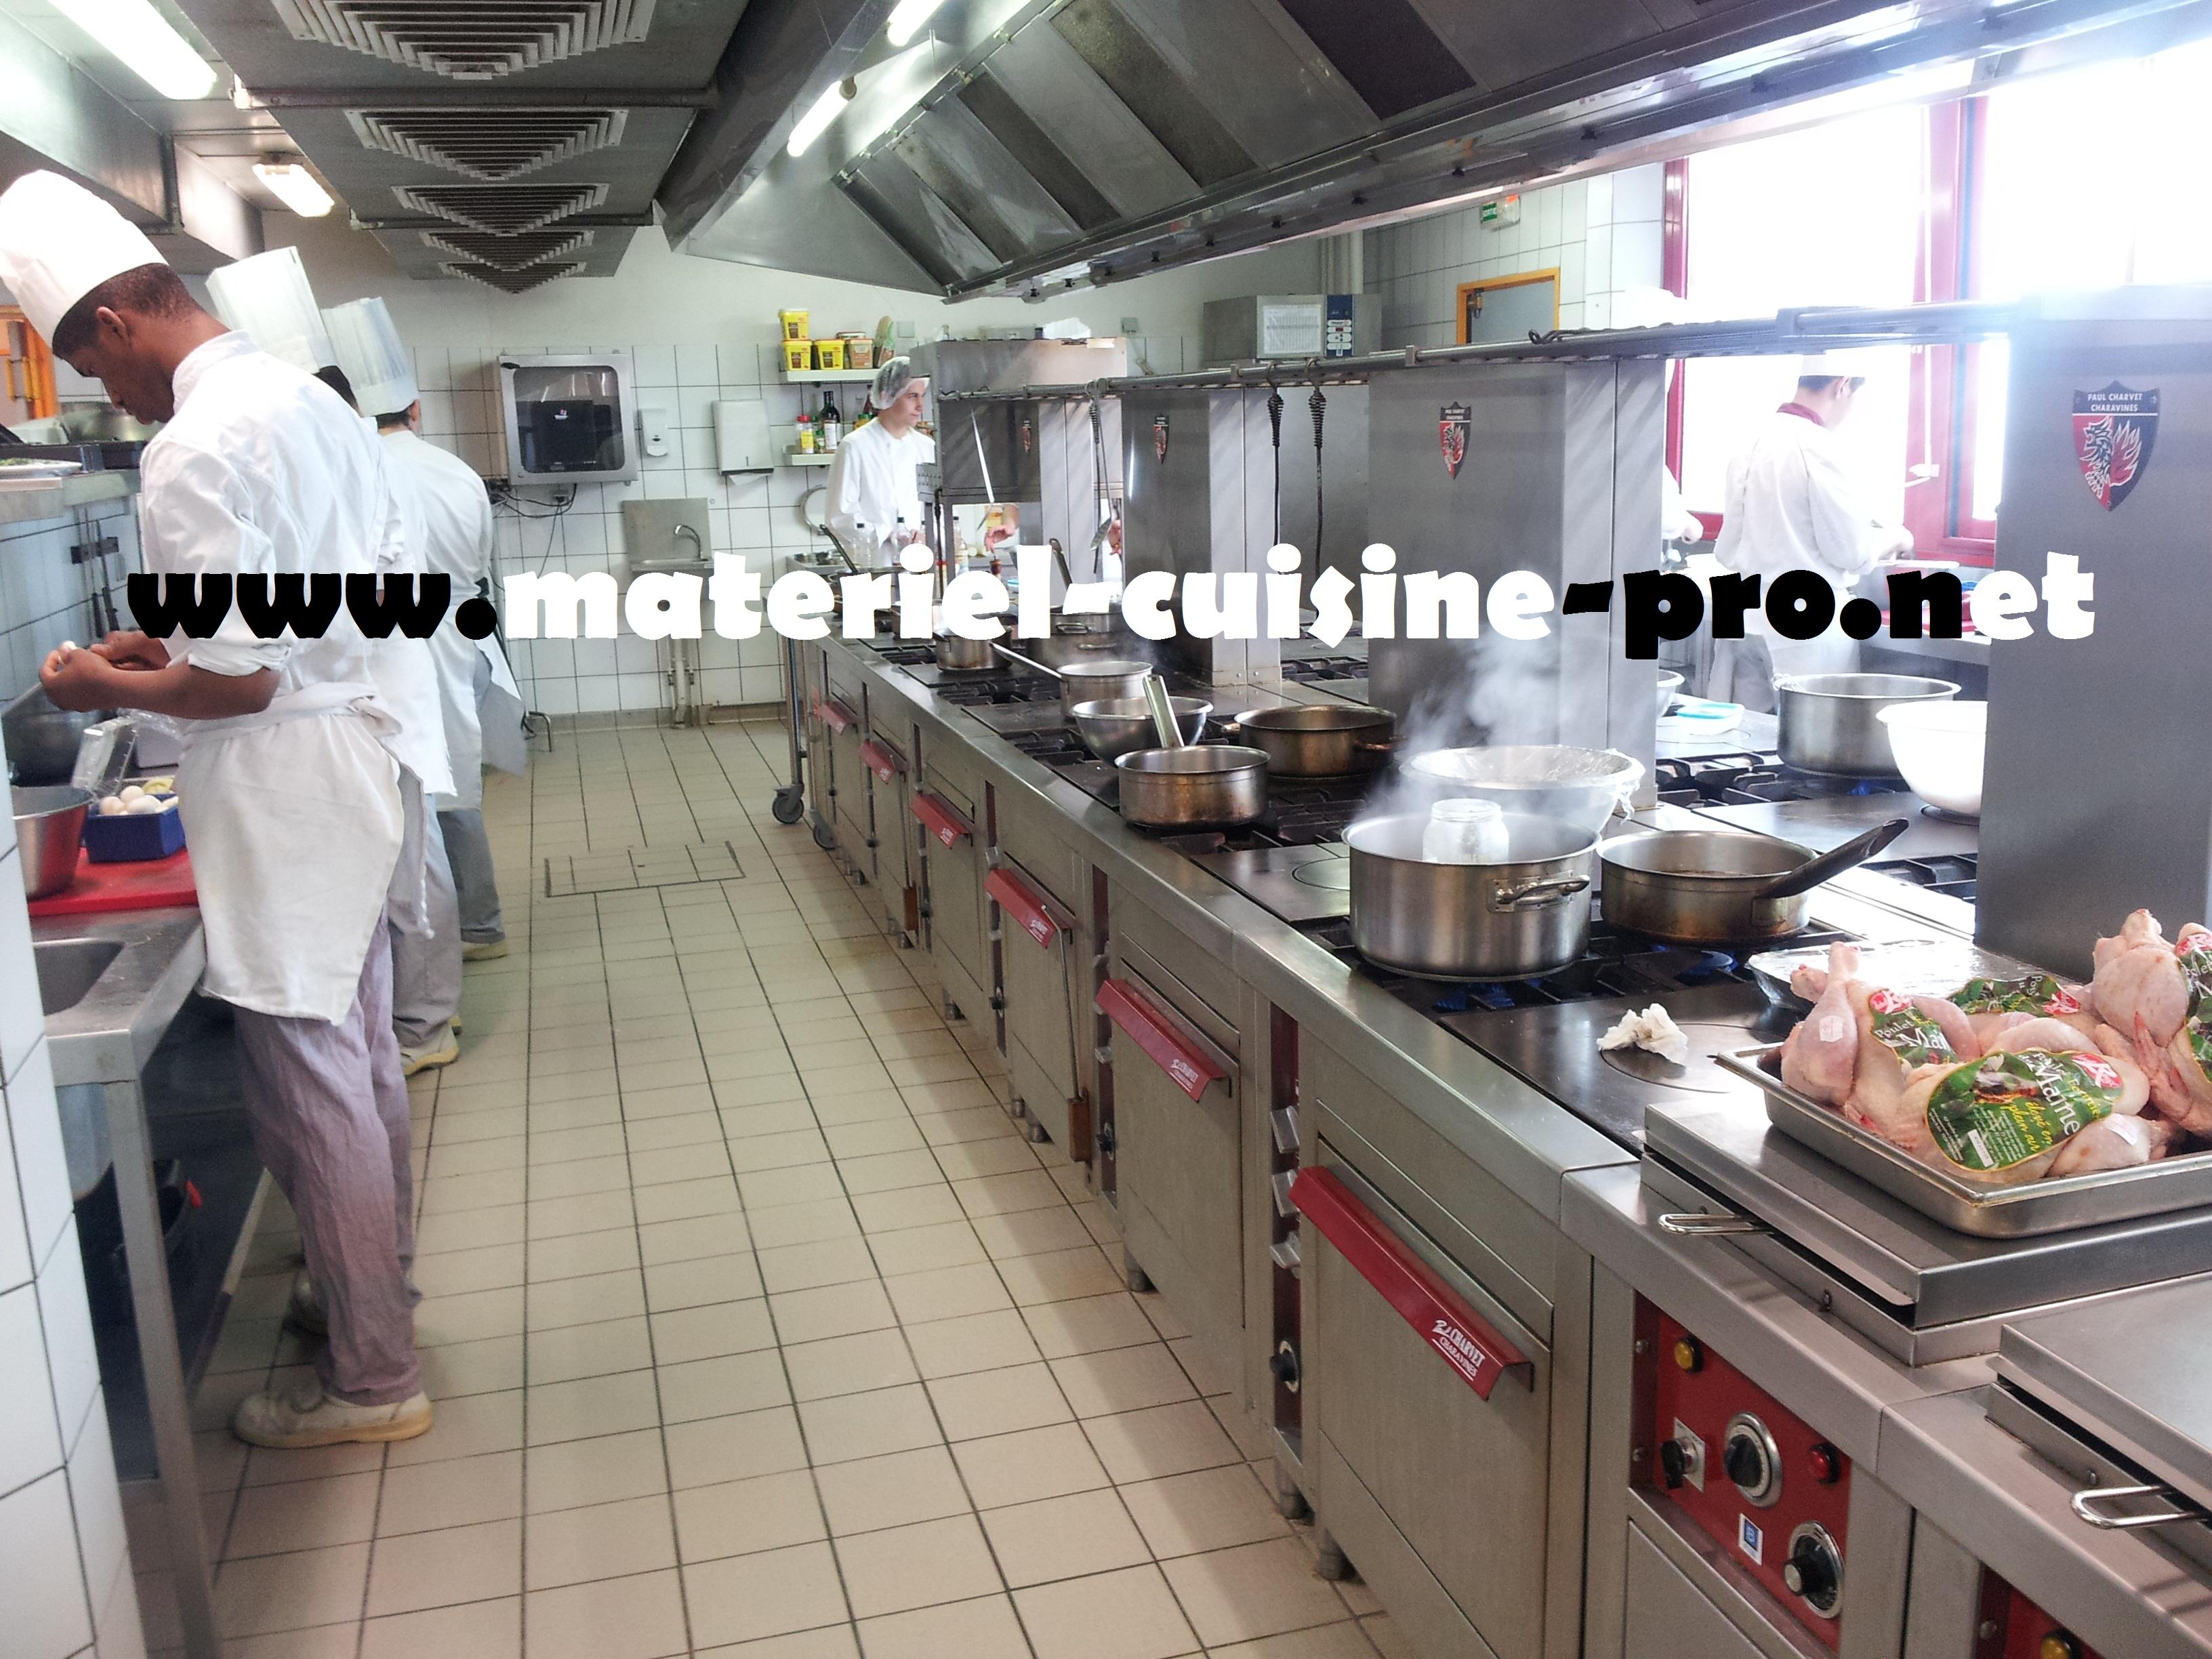 Grossistes Materiel De Cuisine Pro Maroc Materiel Cuisine Pro Maroc